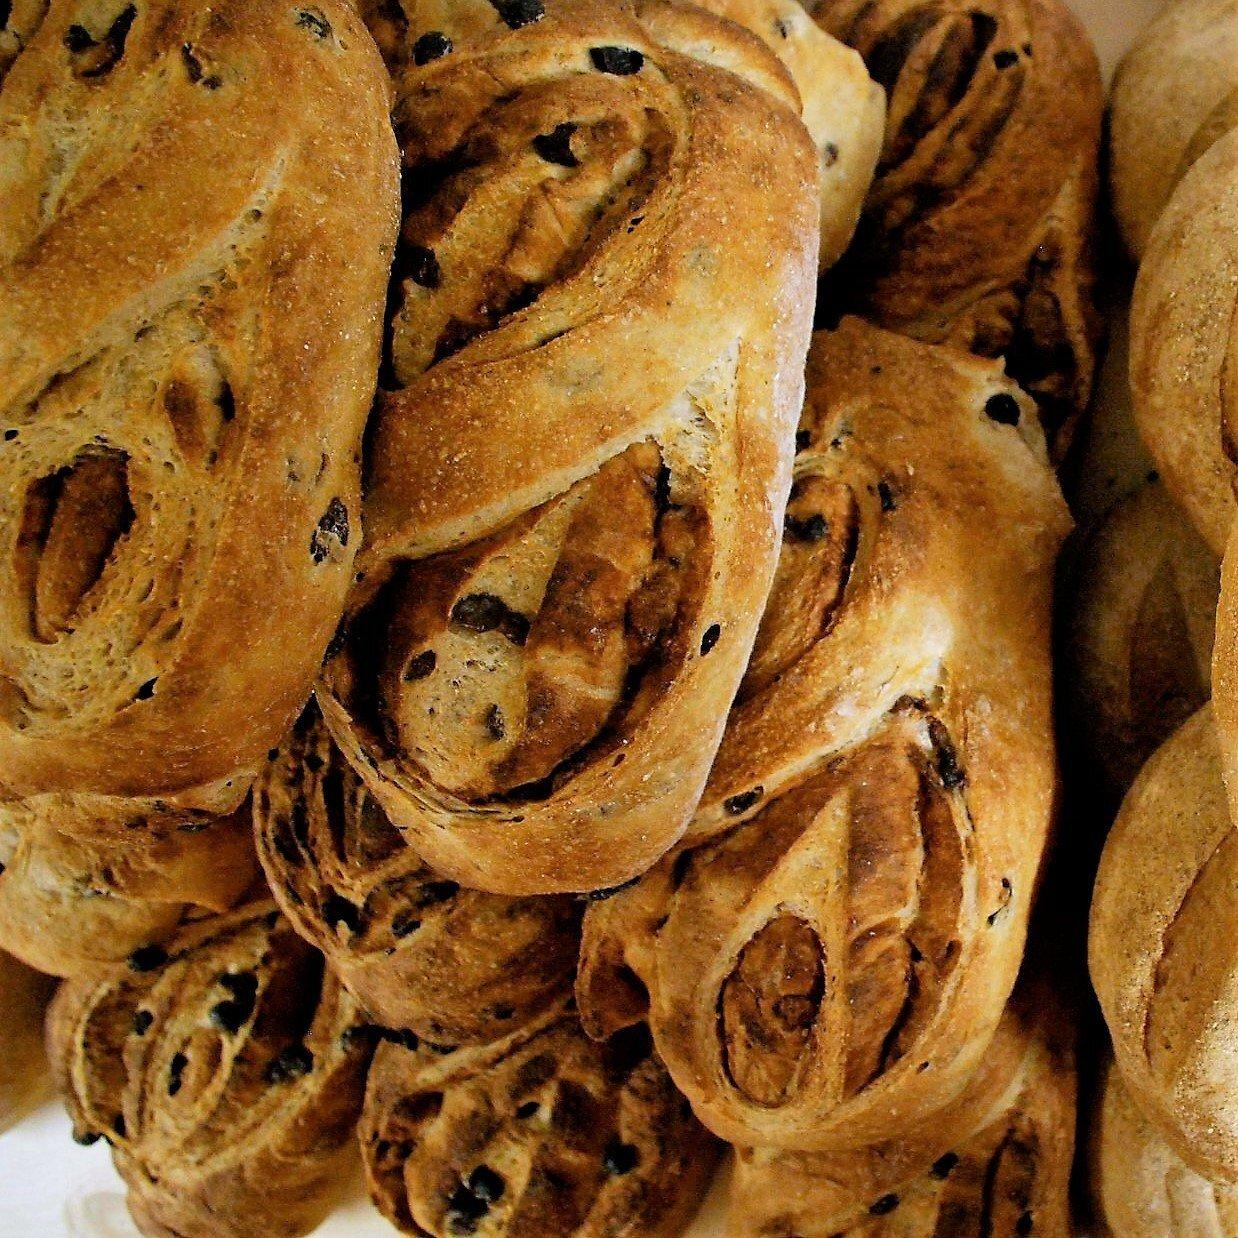 Cinnamon Raisin Swirl Bread 10002